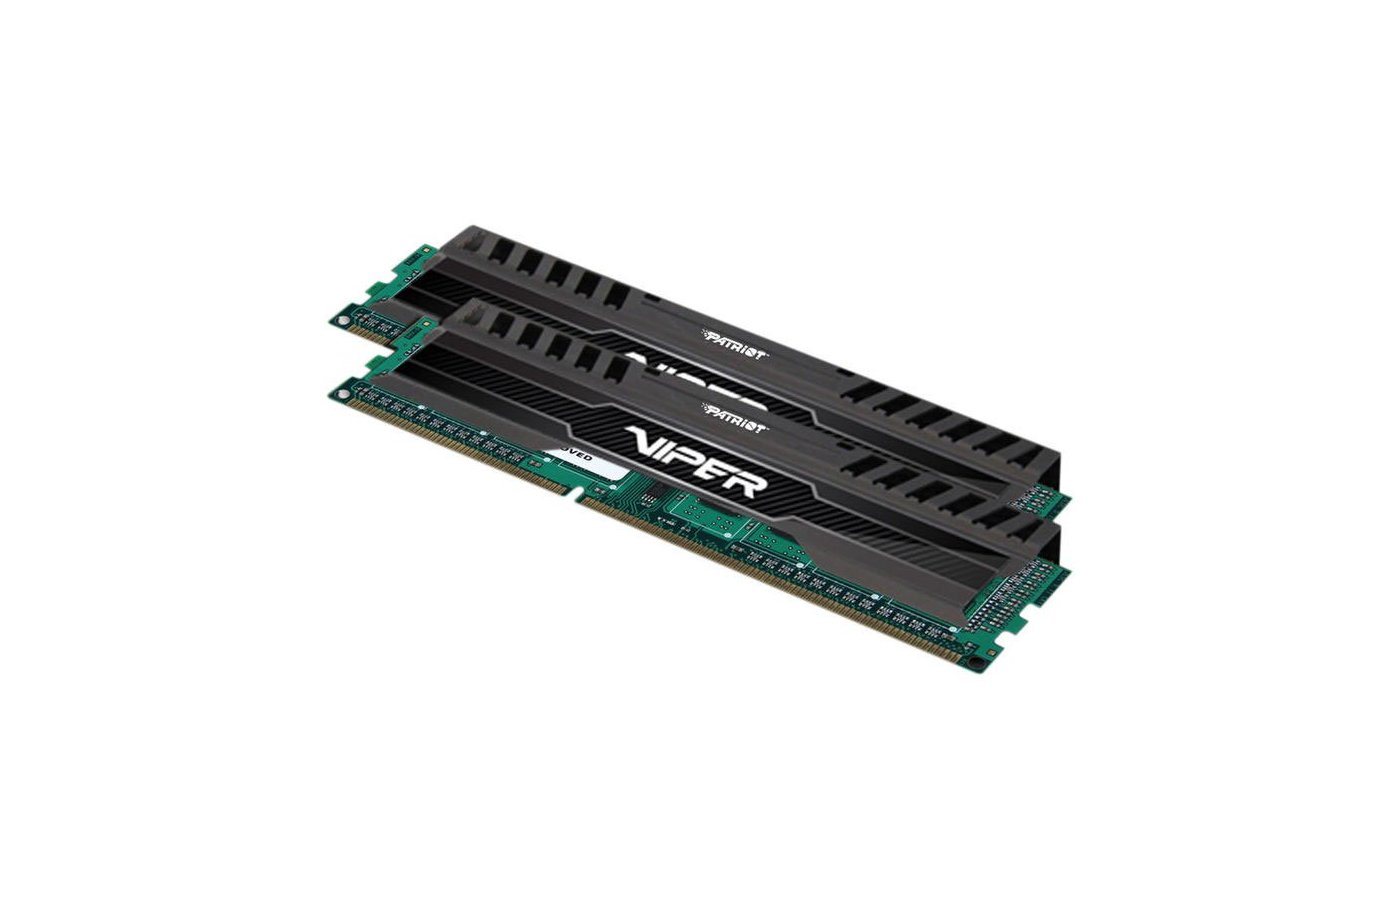 Оперативная память Patriot PV38G186C0K RTL PC3-17000 DDR3 2x4Gb 1866MHz CL10 DIMM